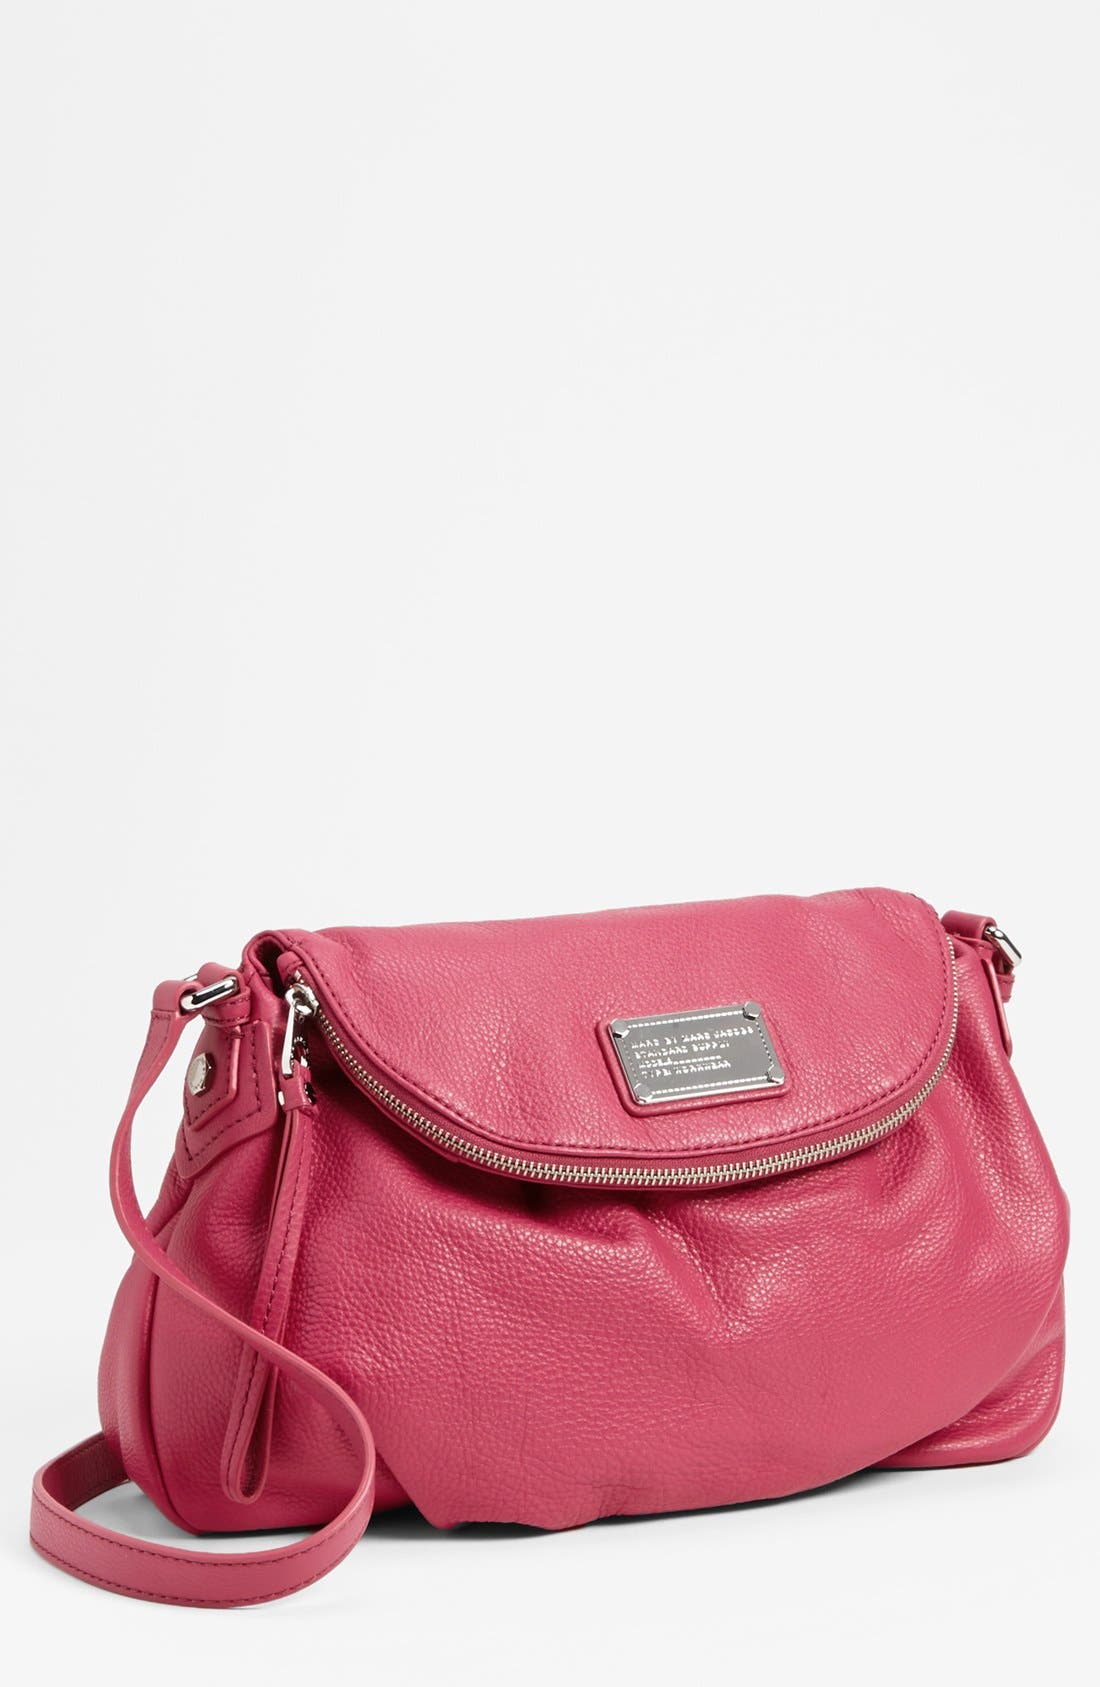 Main Image - MARC BY MARC JACOBS 'Classic Q - Natasha' Crossbody Flap Bag, Medium